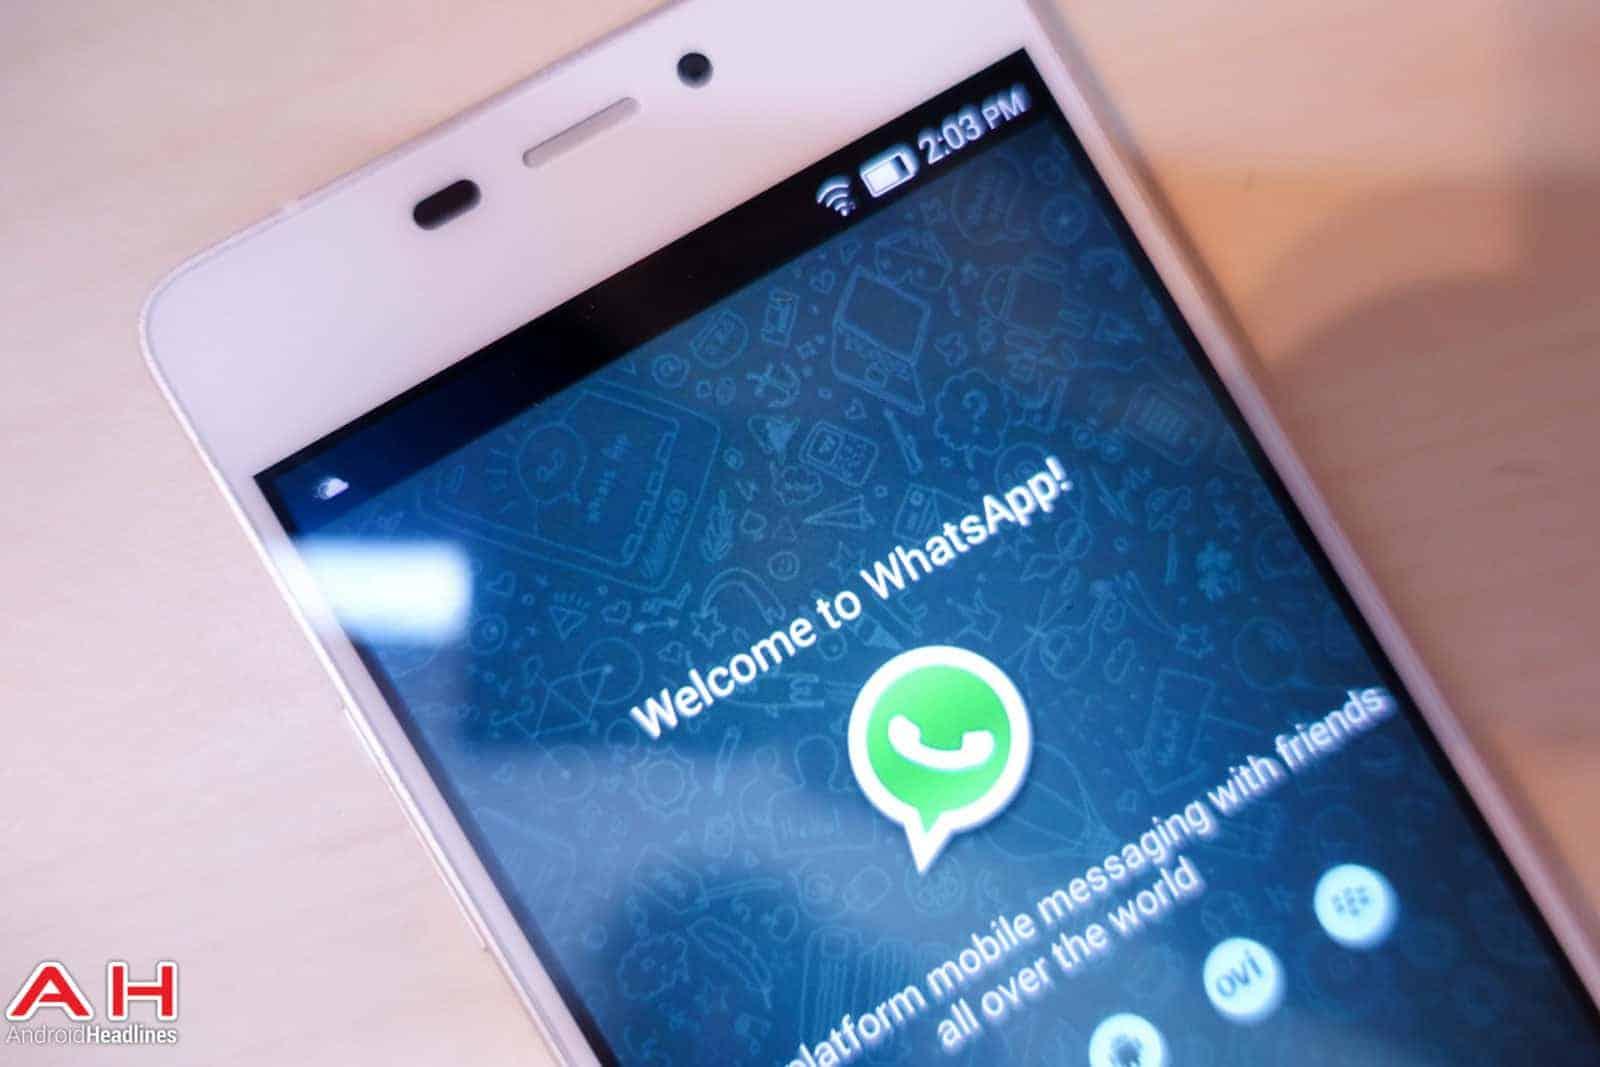 Whatsapp-AH-02995